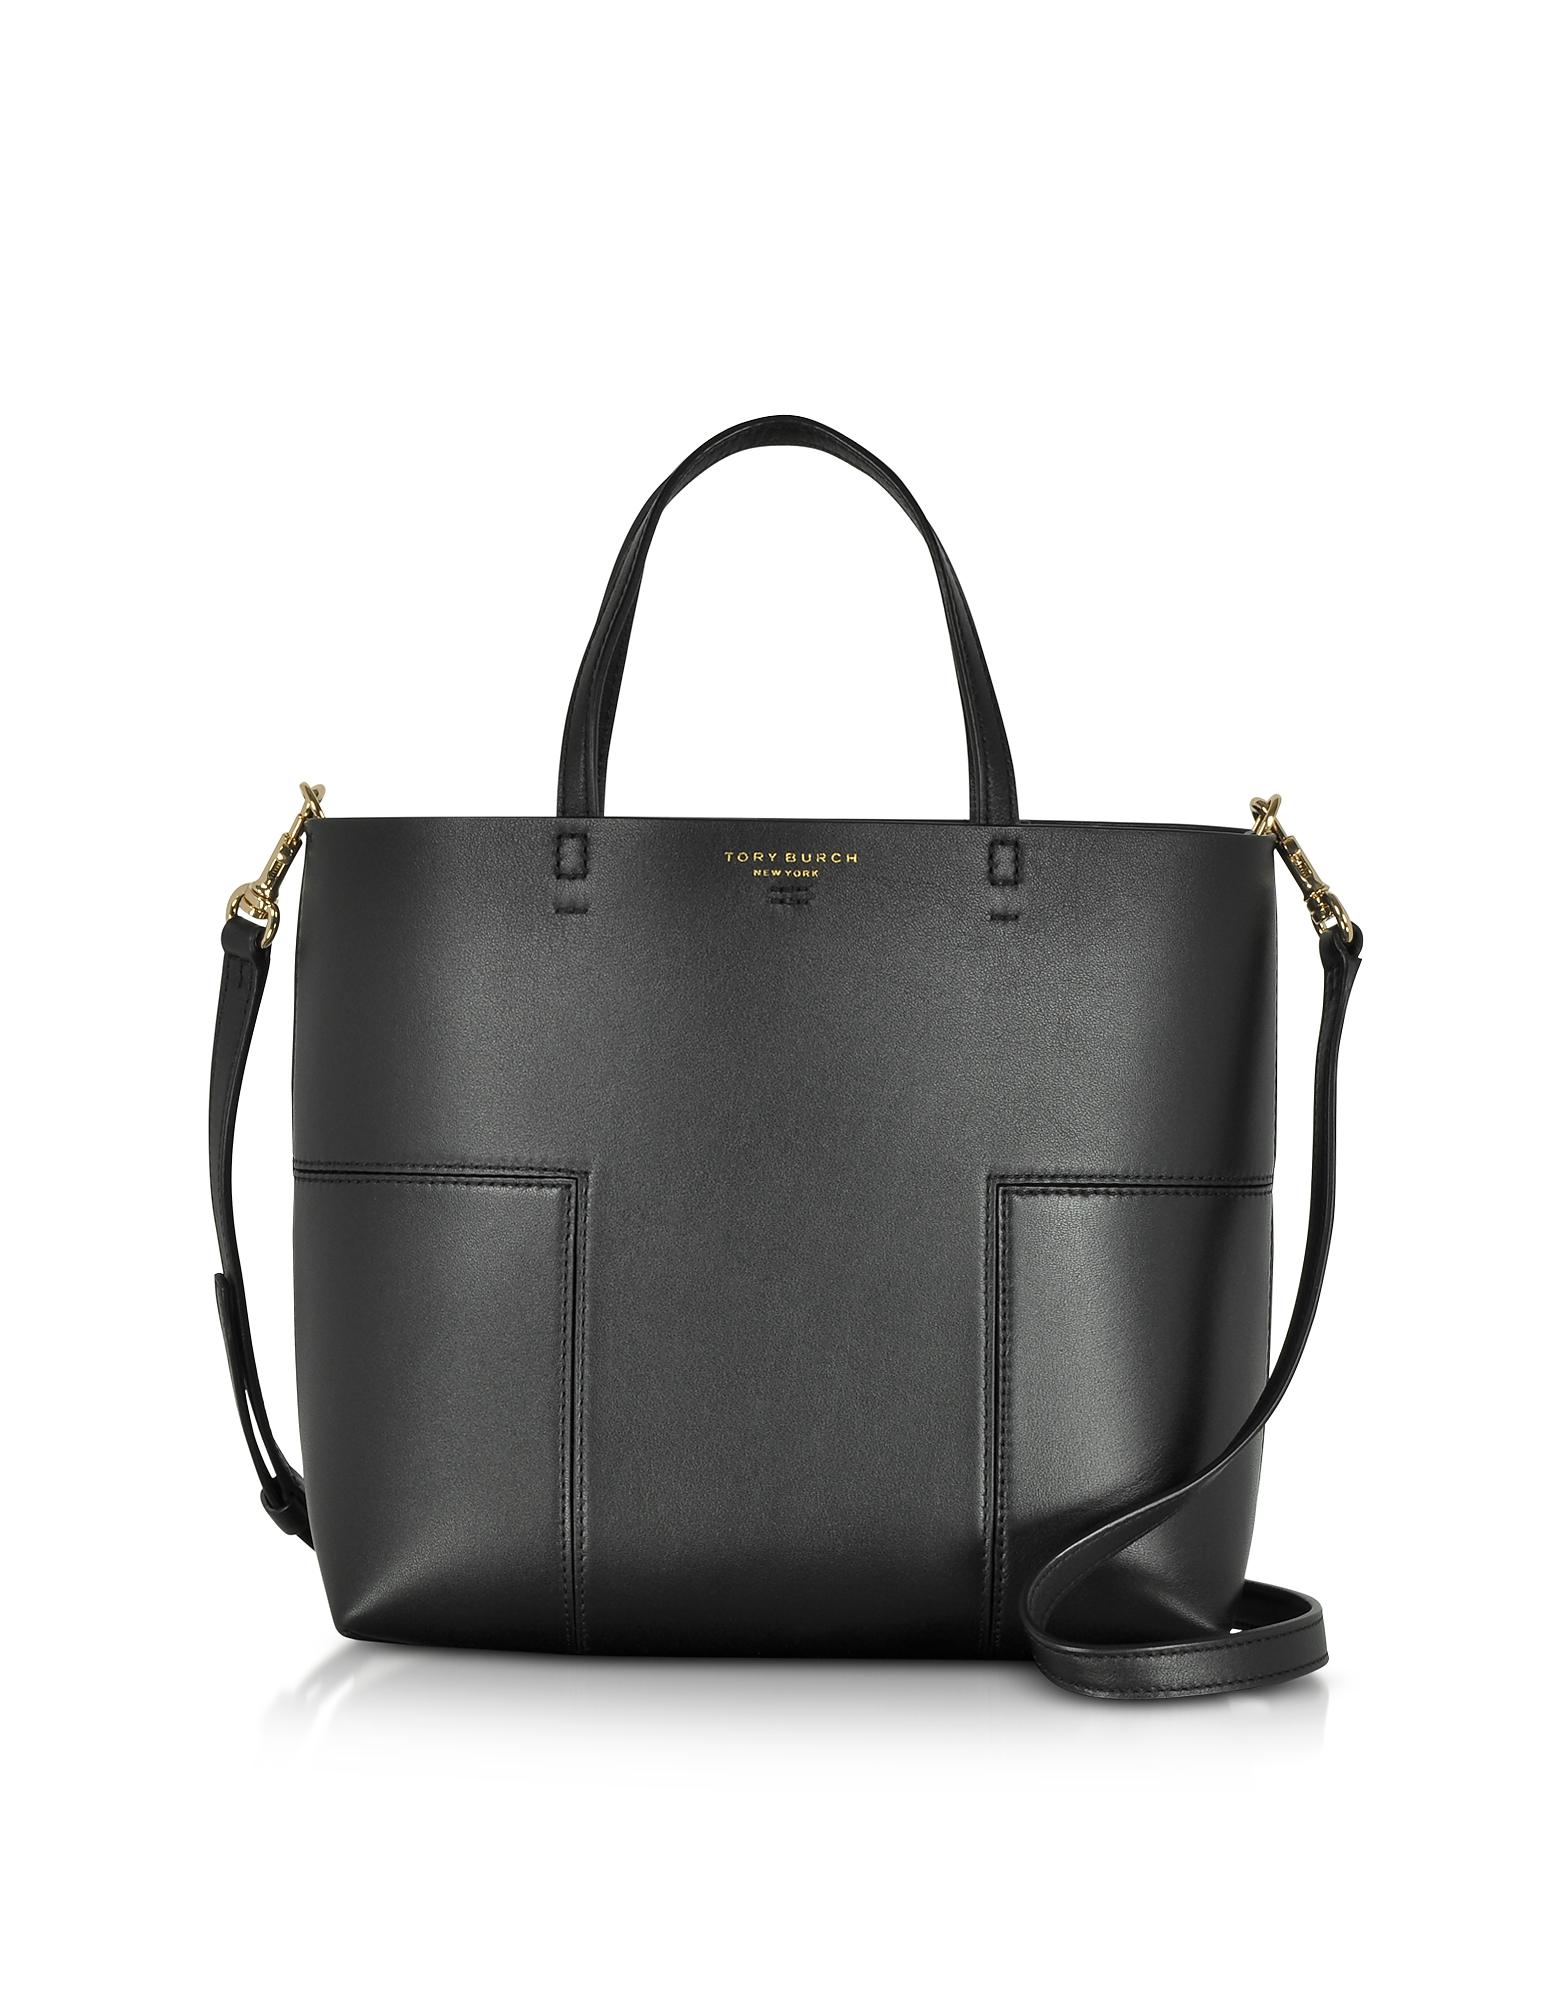 Tory Burch Handbags, Block-T Black Leather Mini Tote Bag